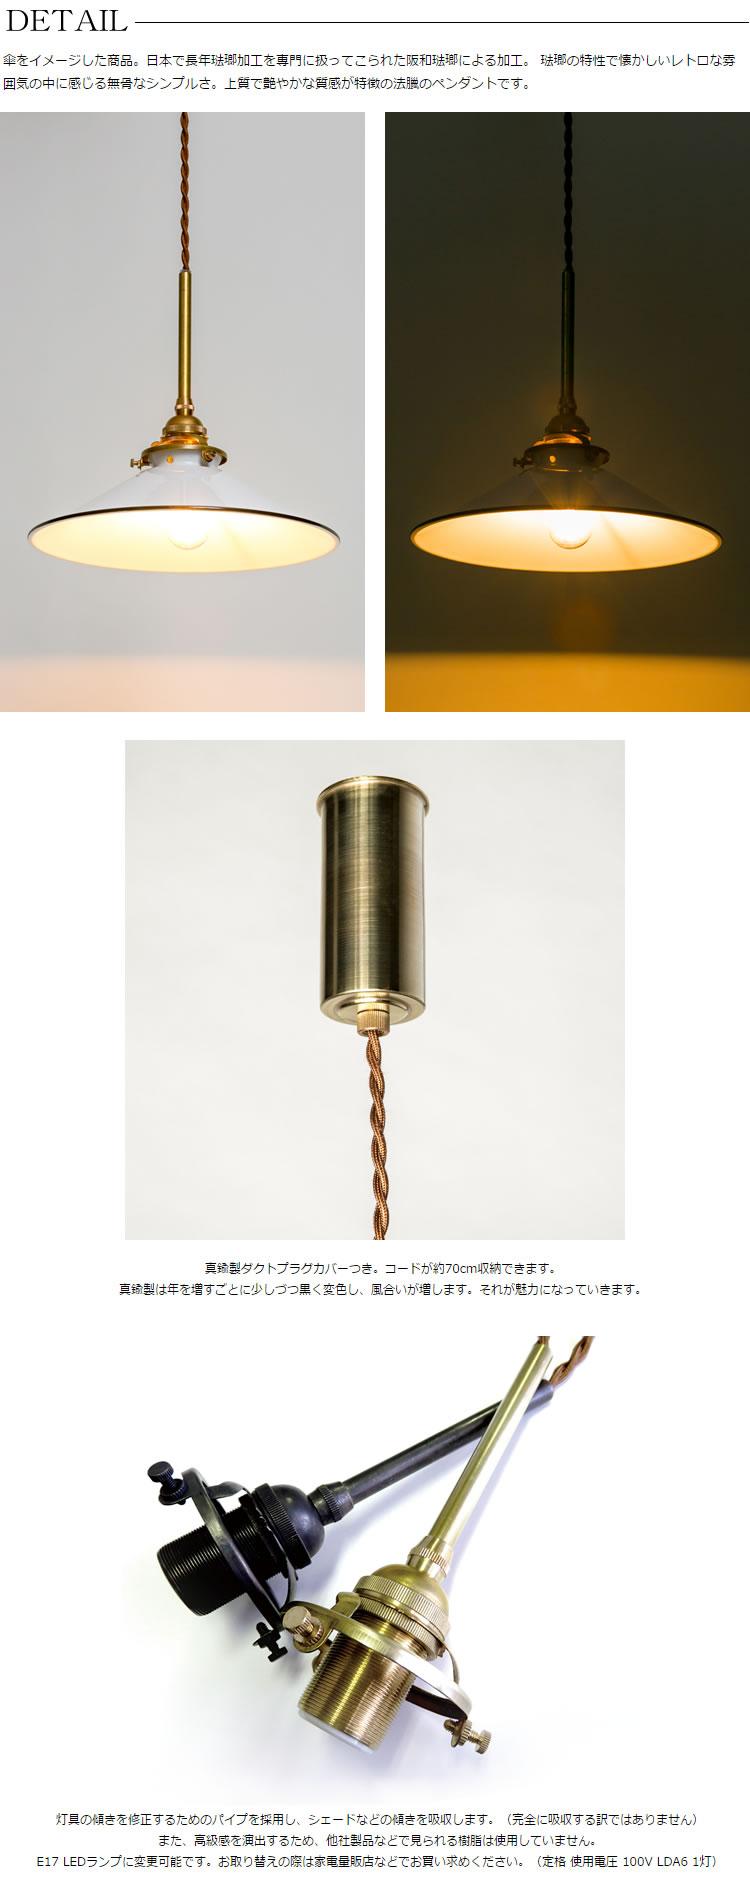 KASA(ホーロー白・引掛・真鍮黒染)